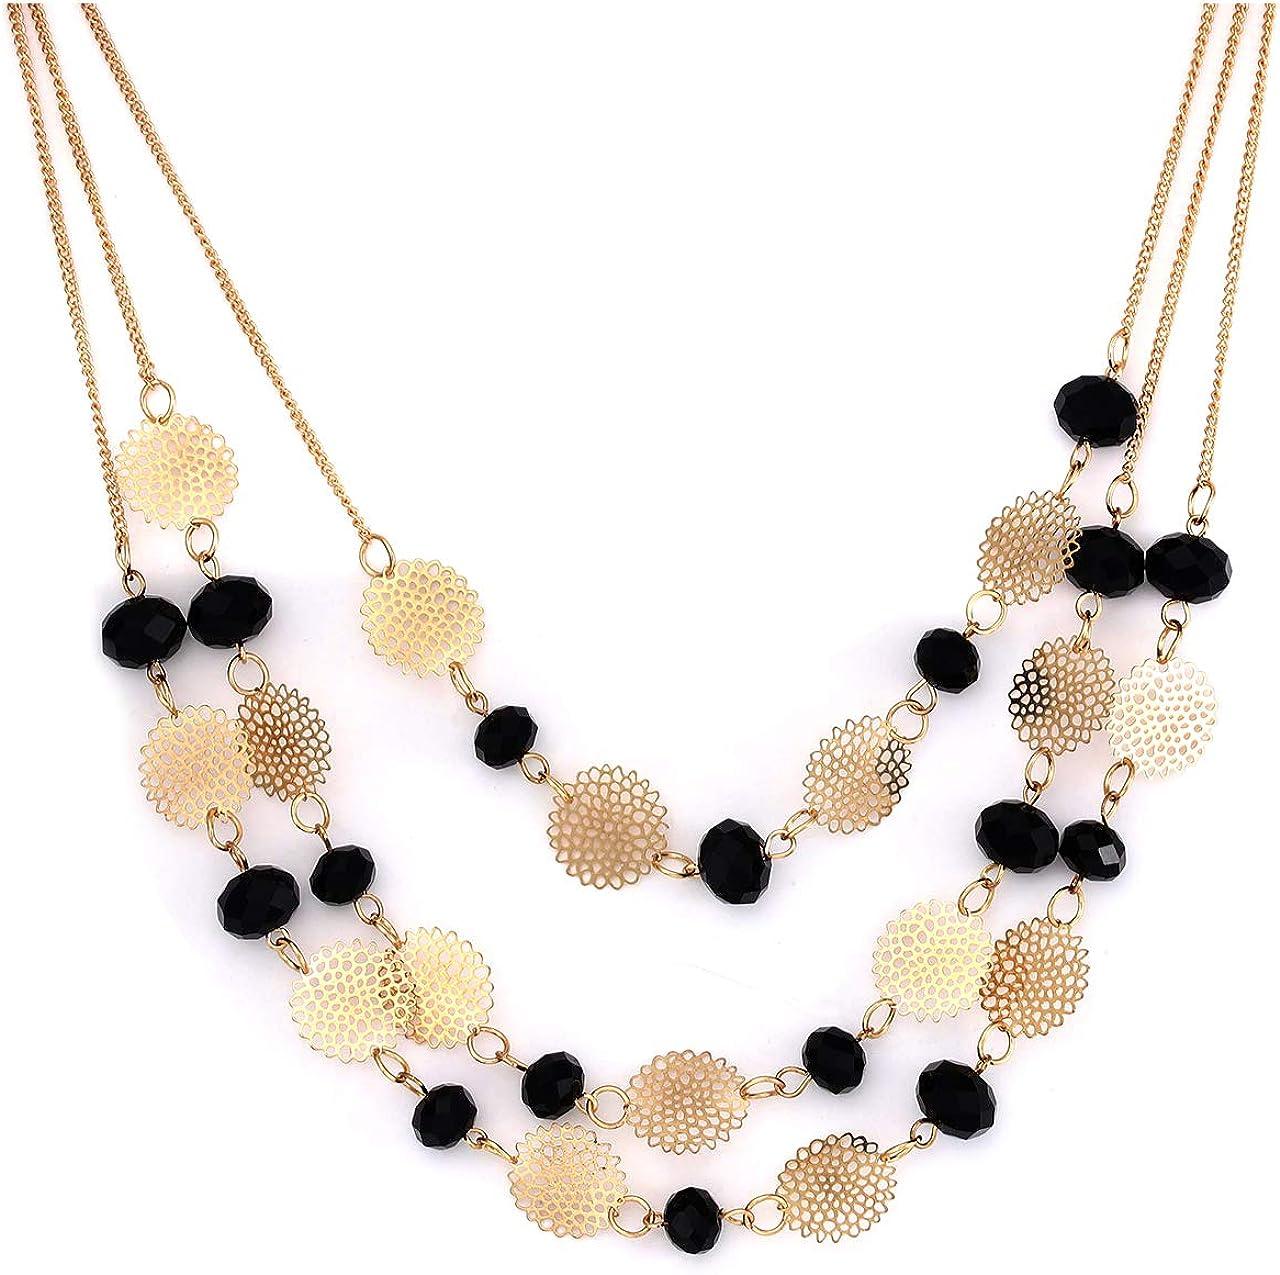 Vintage Genuine Red Coral Beads Stretch Bracelet  Boho Chunky Beaded Bracelet  Adjustable Size